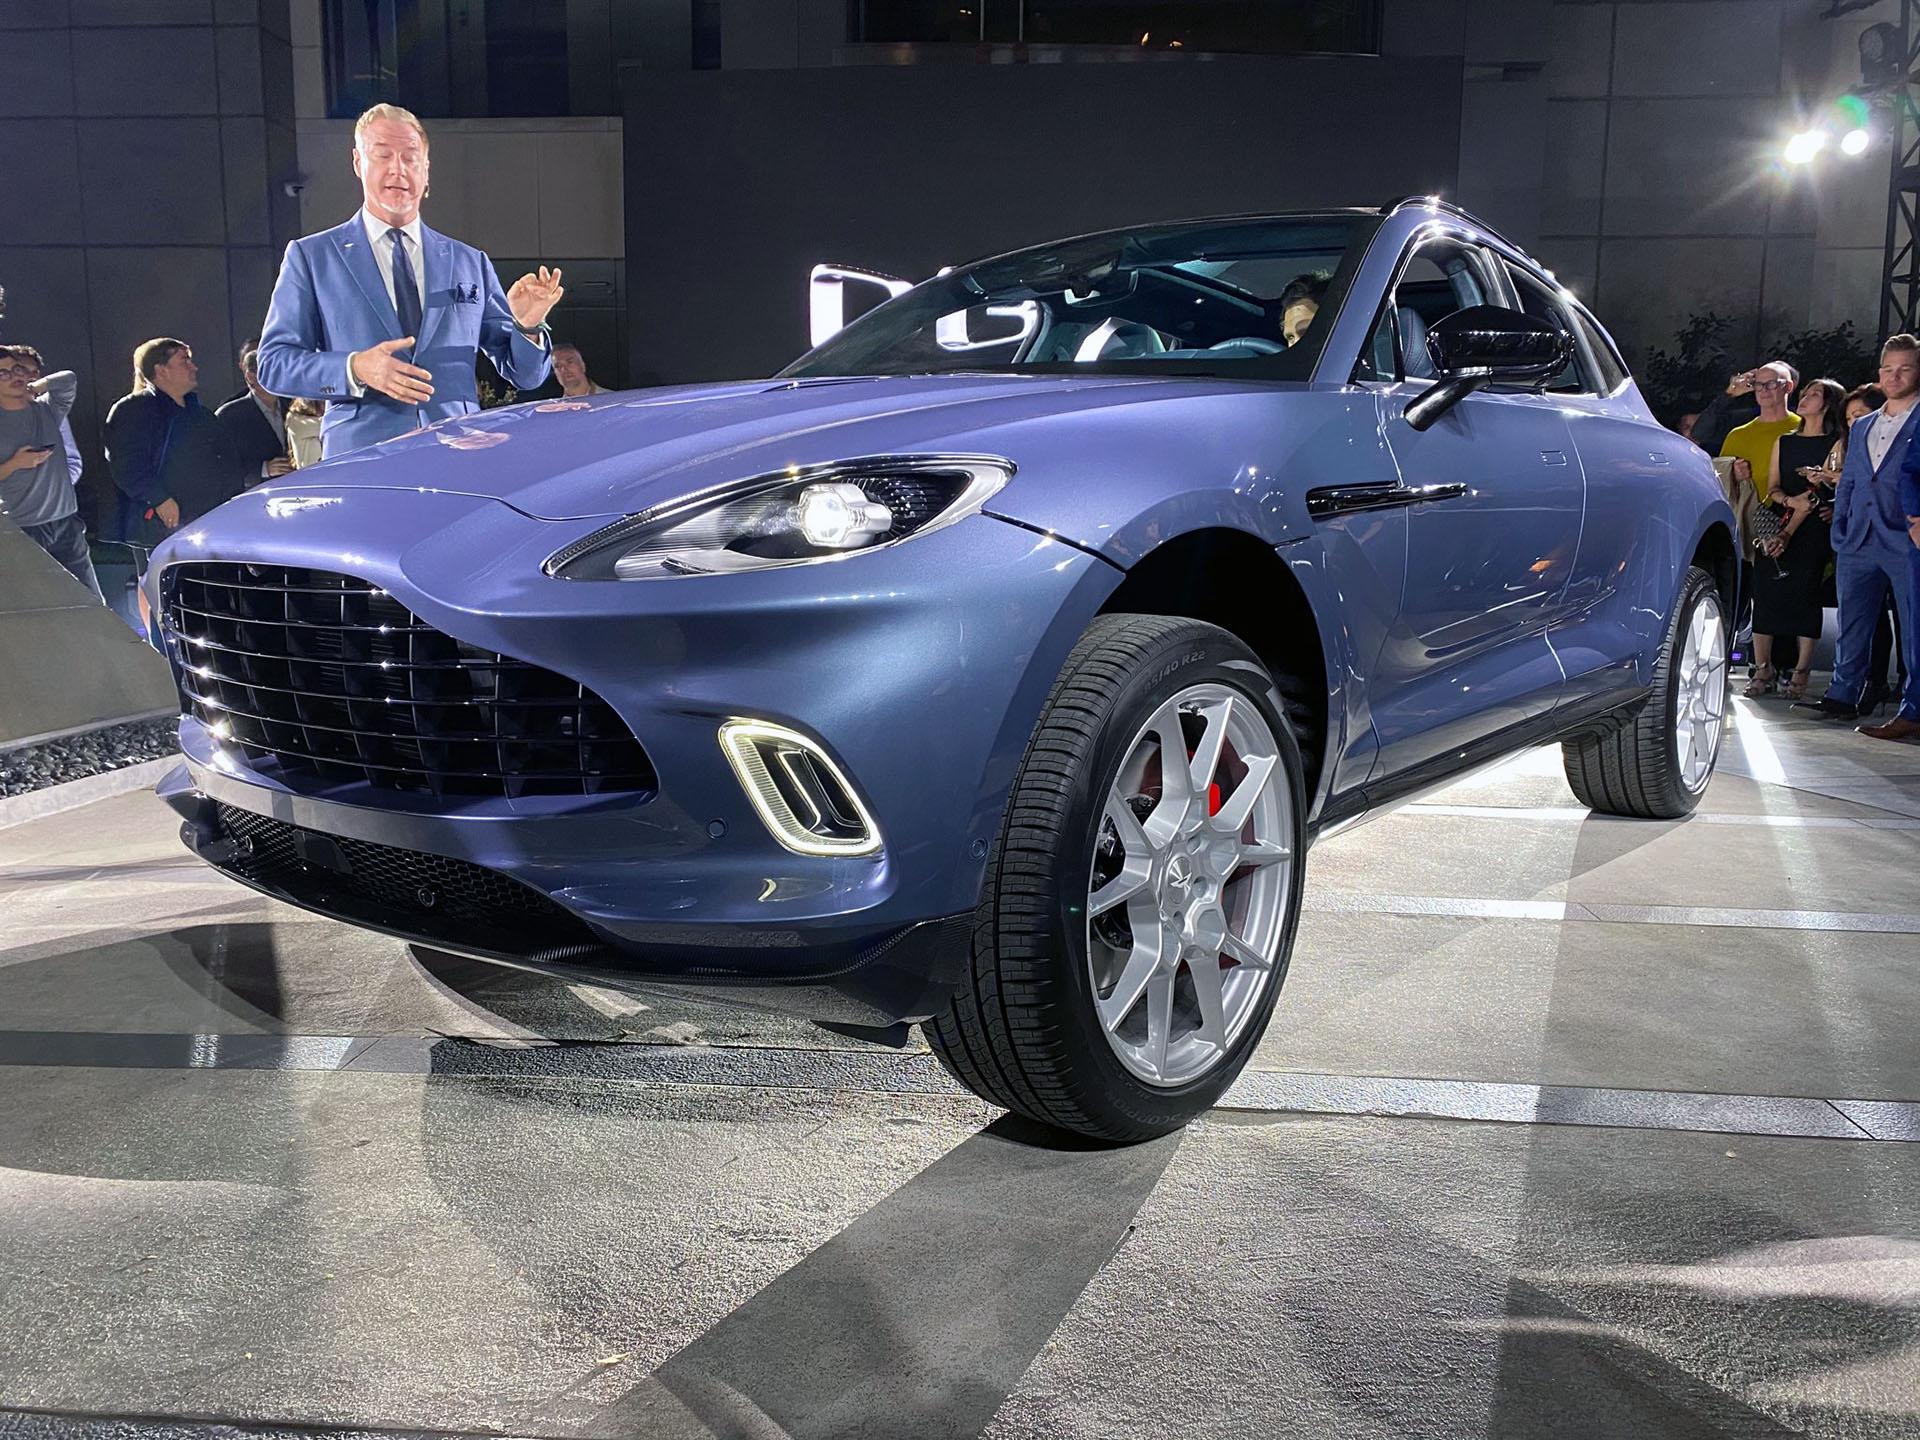 2021 Aston Martin Dbx Is A Sumptuous High Riding Sports Wagon